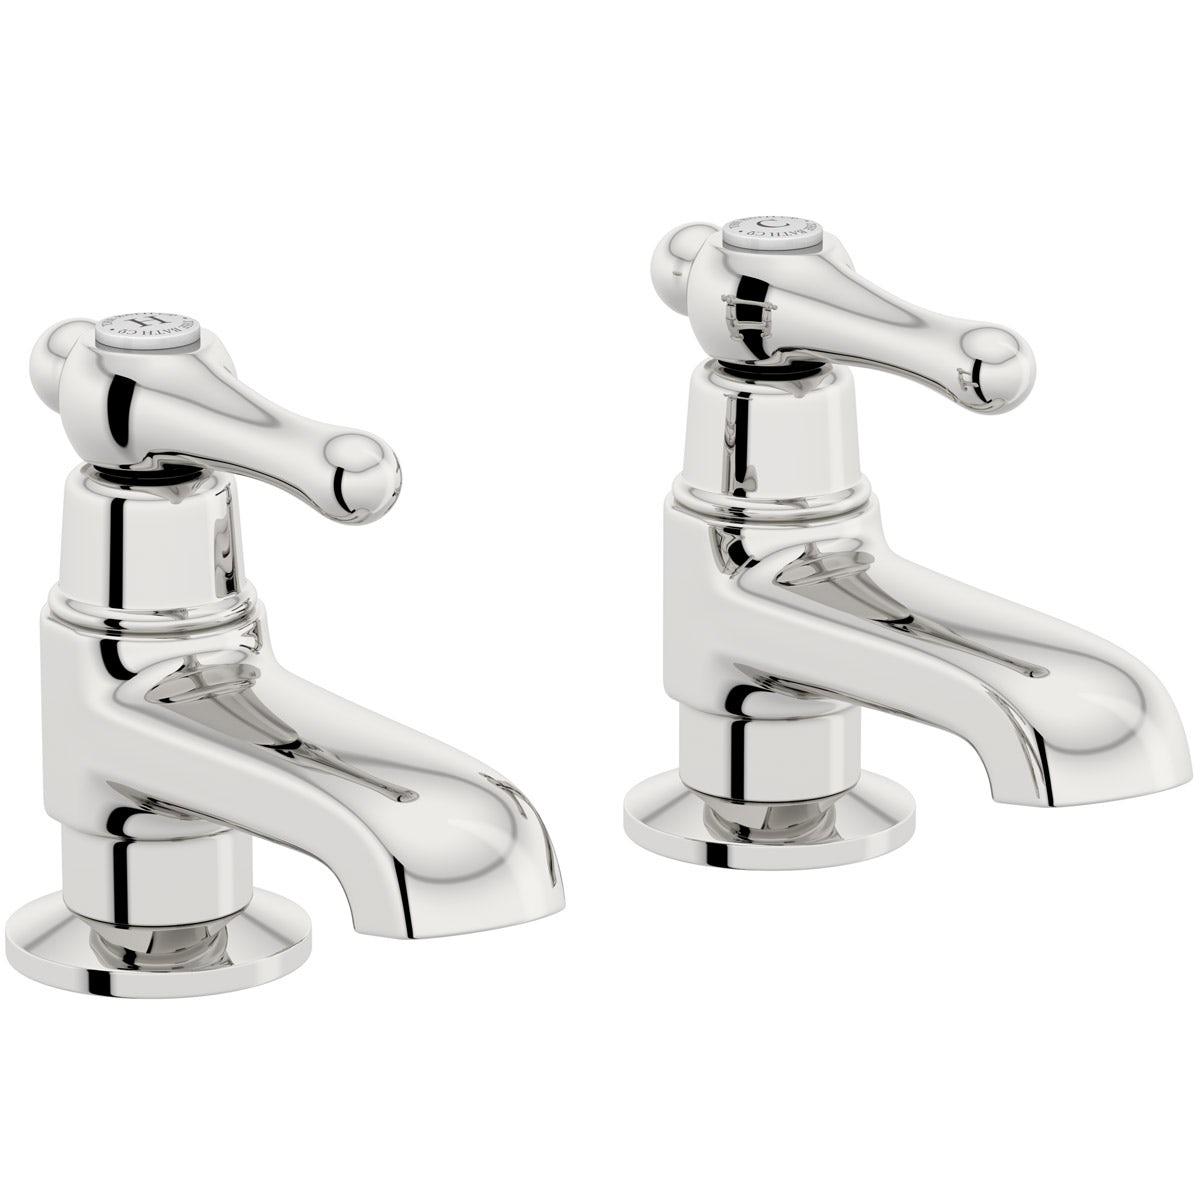 The Bath Co. Camberley lever bath pillar taps